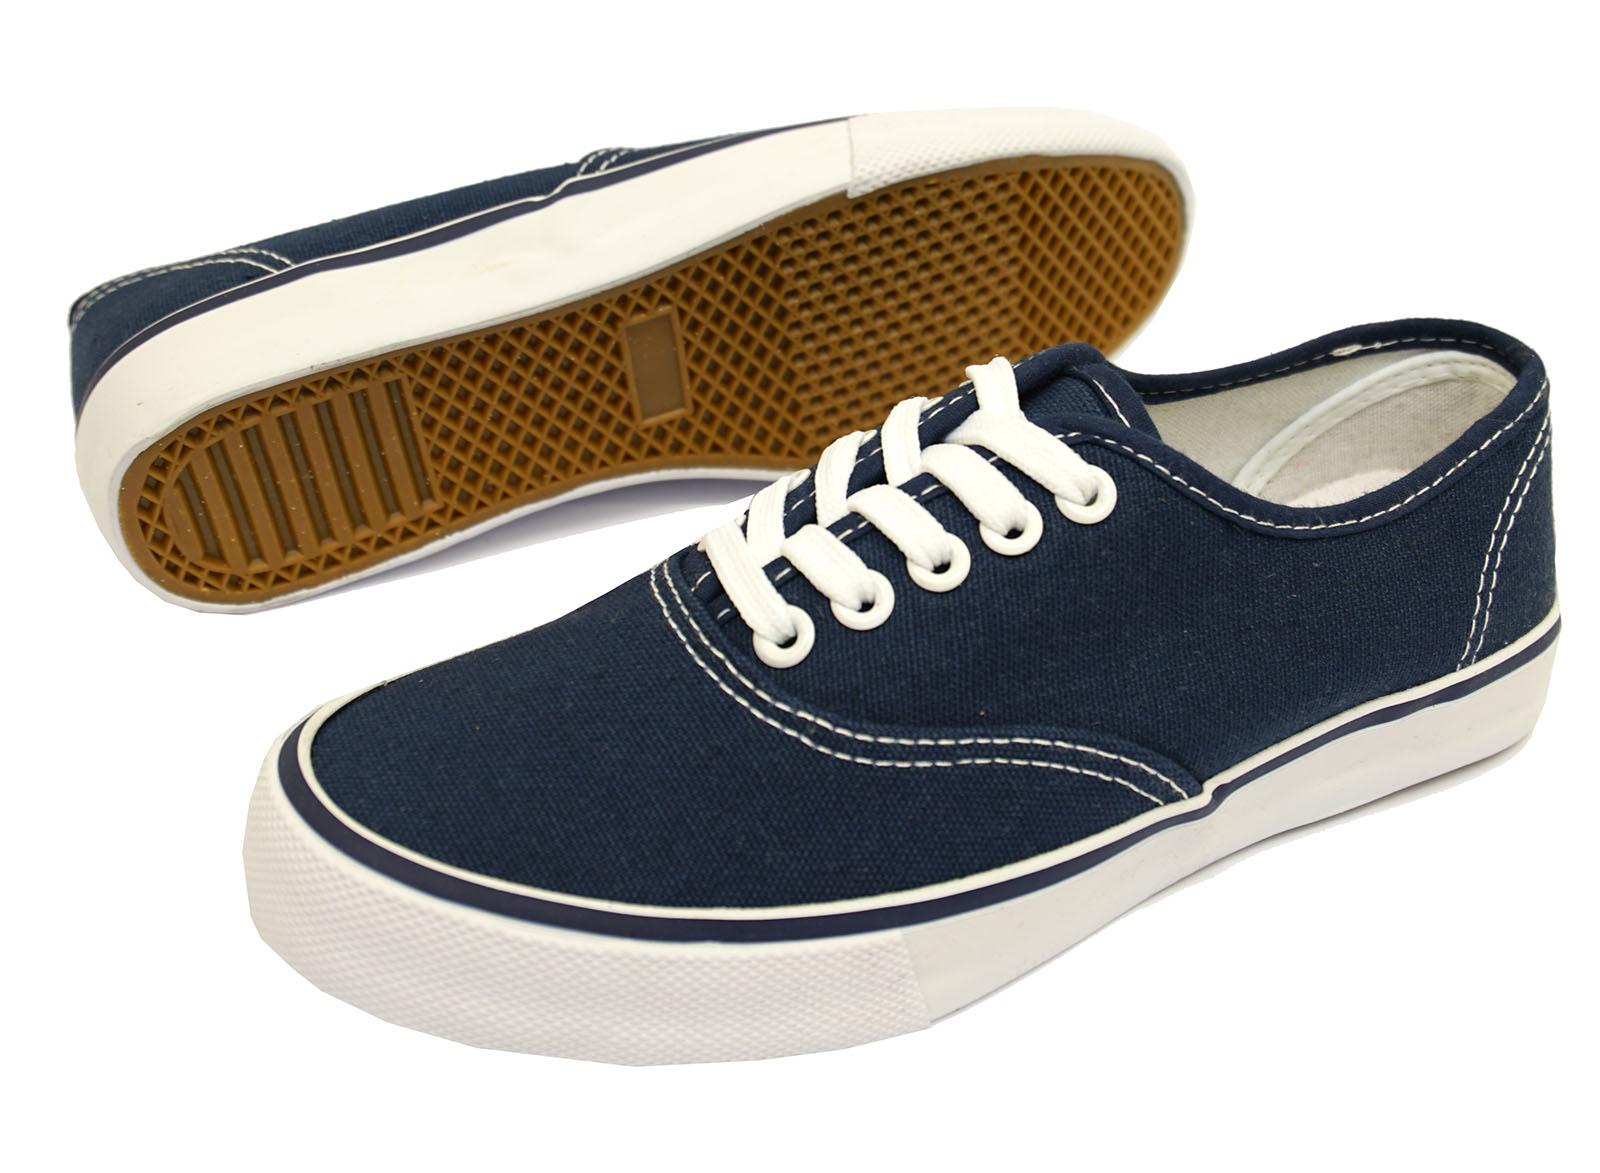 Damas Azul Con Cordones Lona Playera Bombas Zapatos Informales Planos entrenador Tallas 3-8